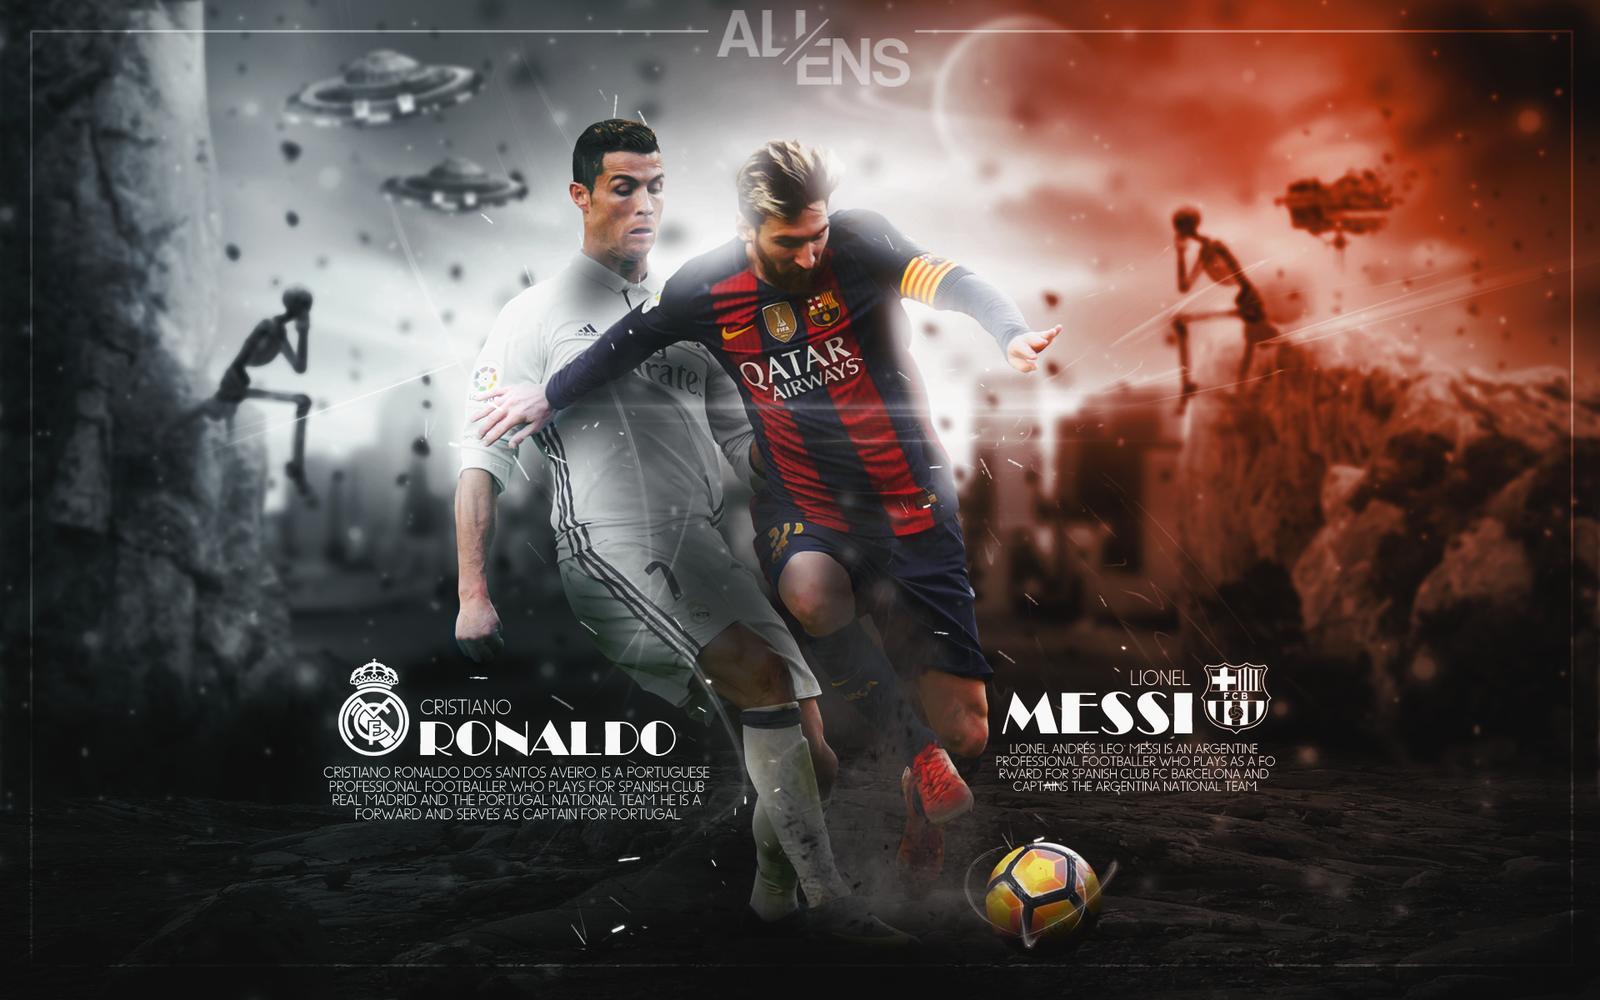 Messi Ronaldo Wallpapers Top Free Messi Ronaldo Backgrounds Wallpaperaccess